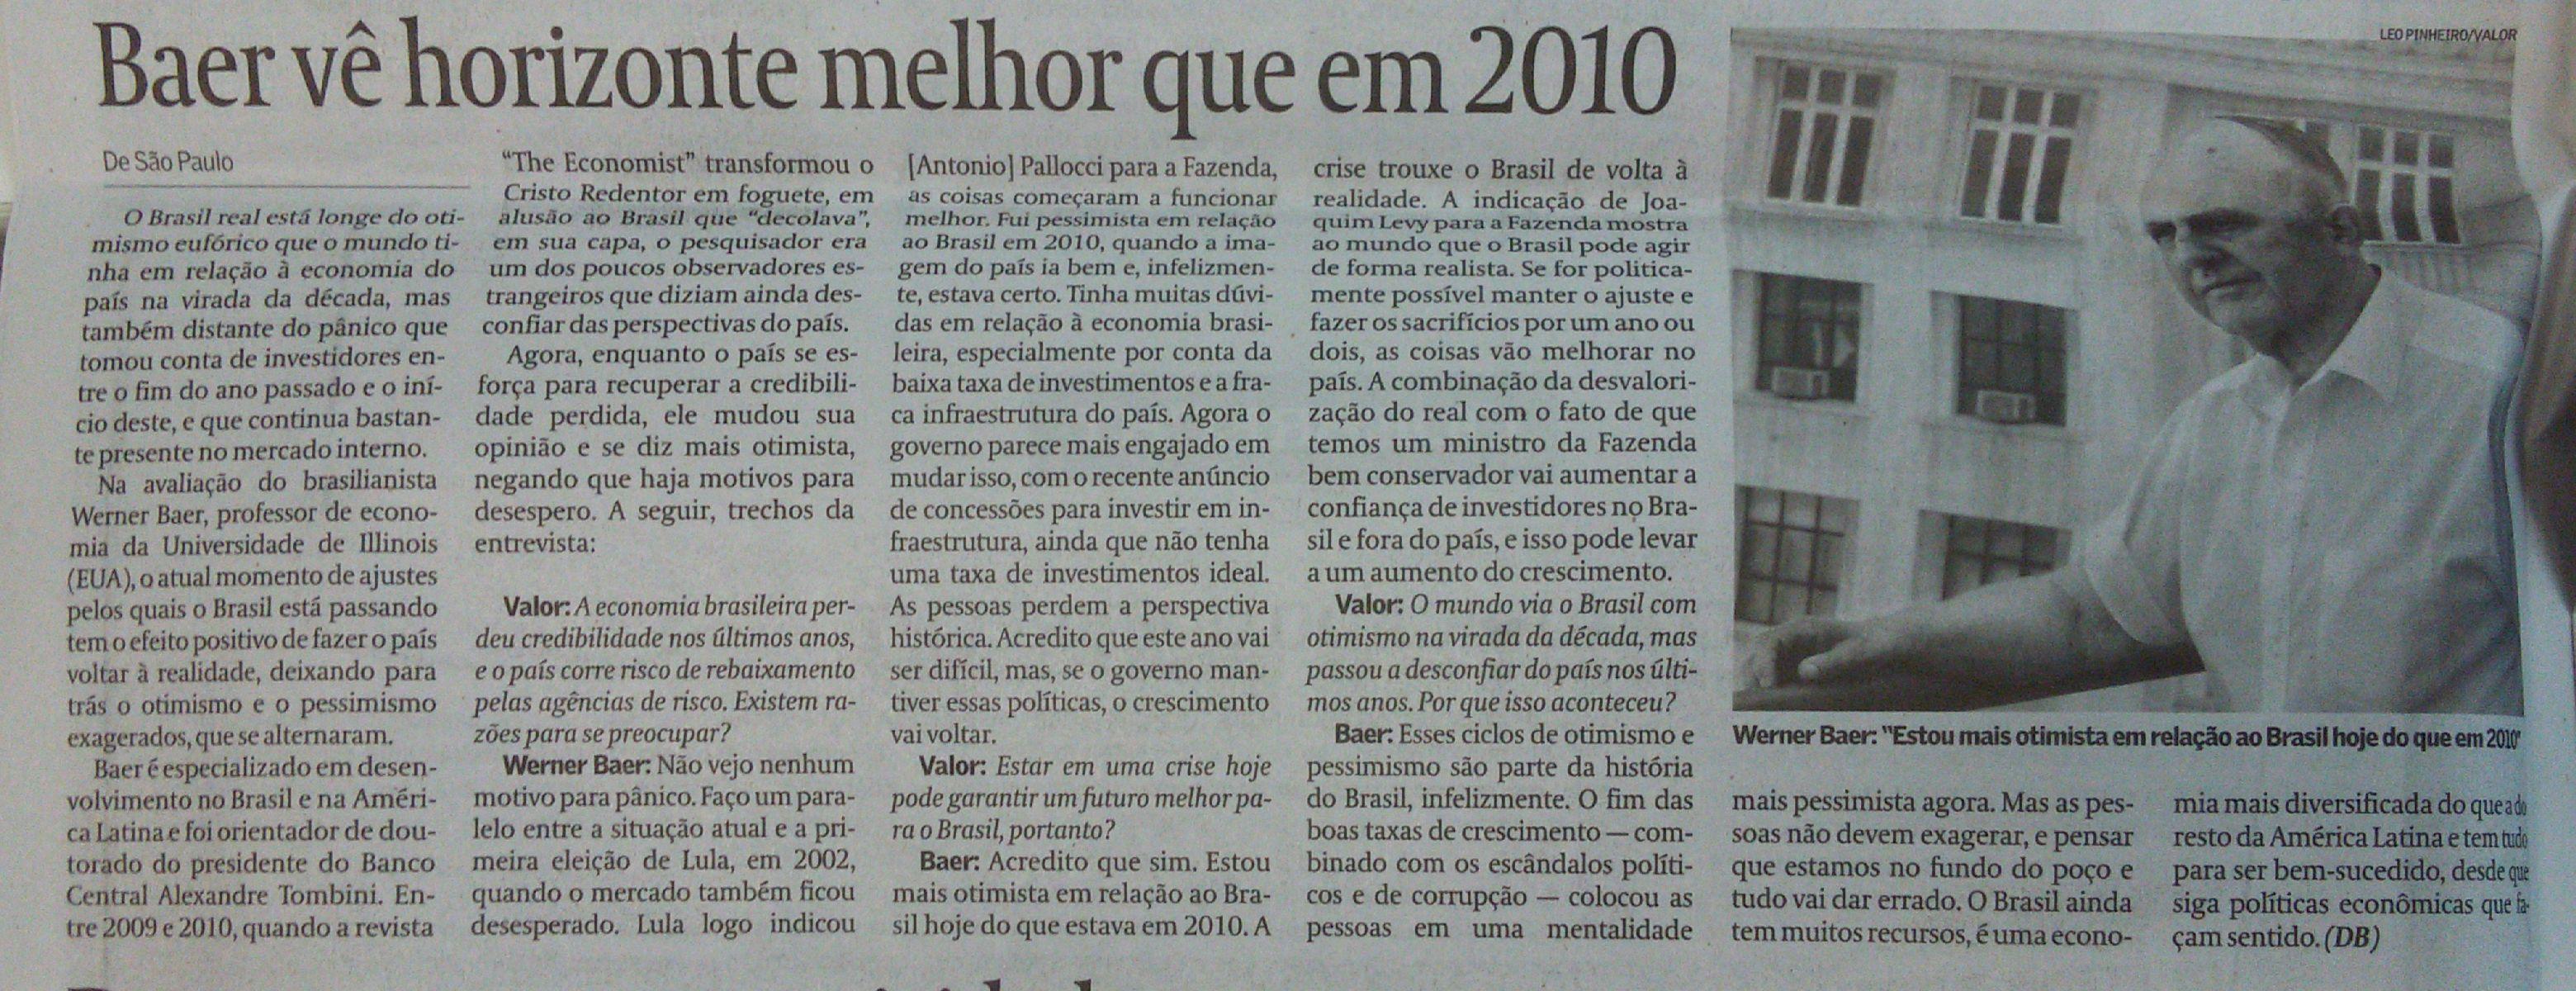 Entrevista do brasilianista Werner Baer ao 'Valor Econômico'